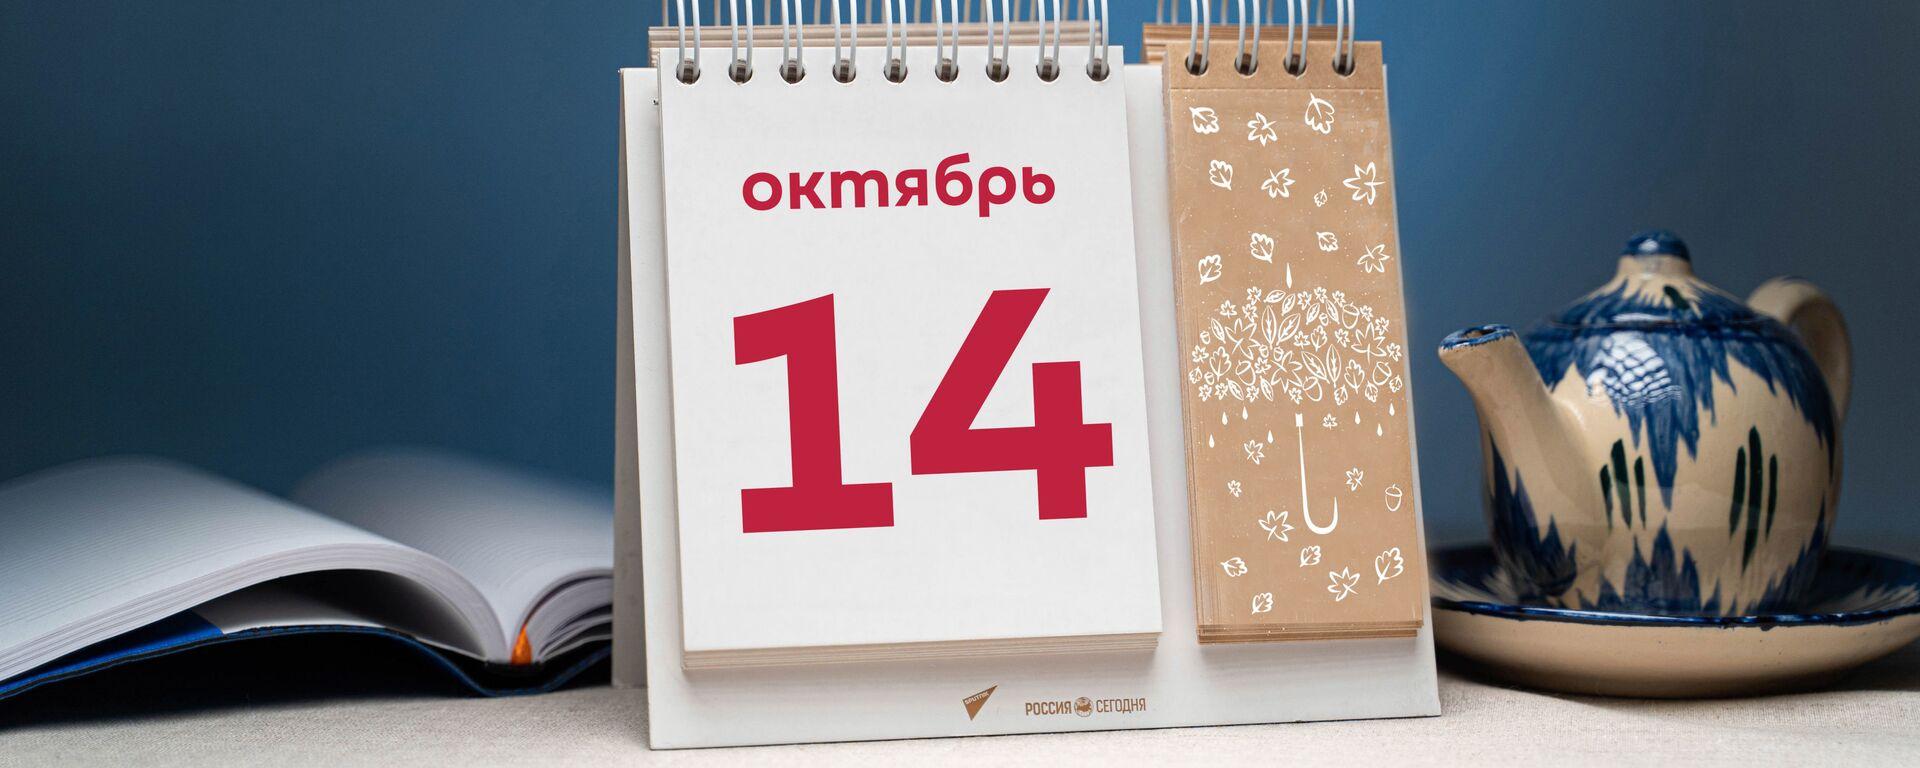 День 14 октября - Sputnik Тоҷикистон, 1920, 14.10.2021